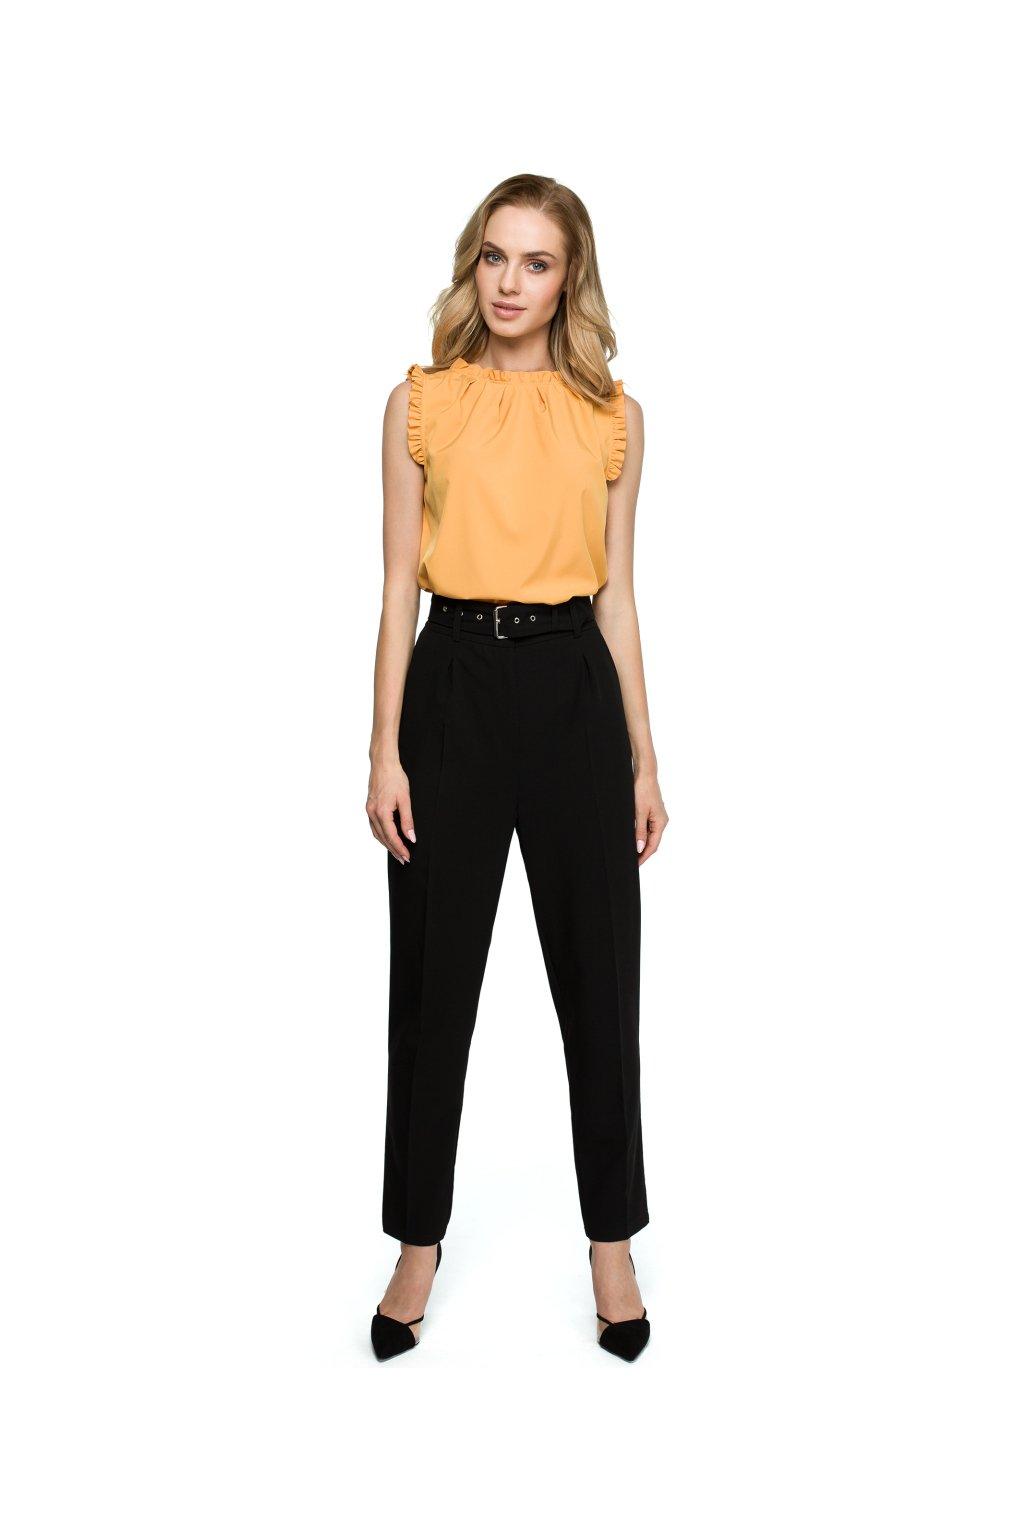 s124 Cerne kalhoty 1